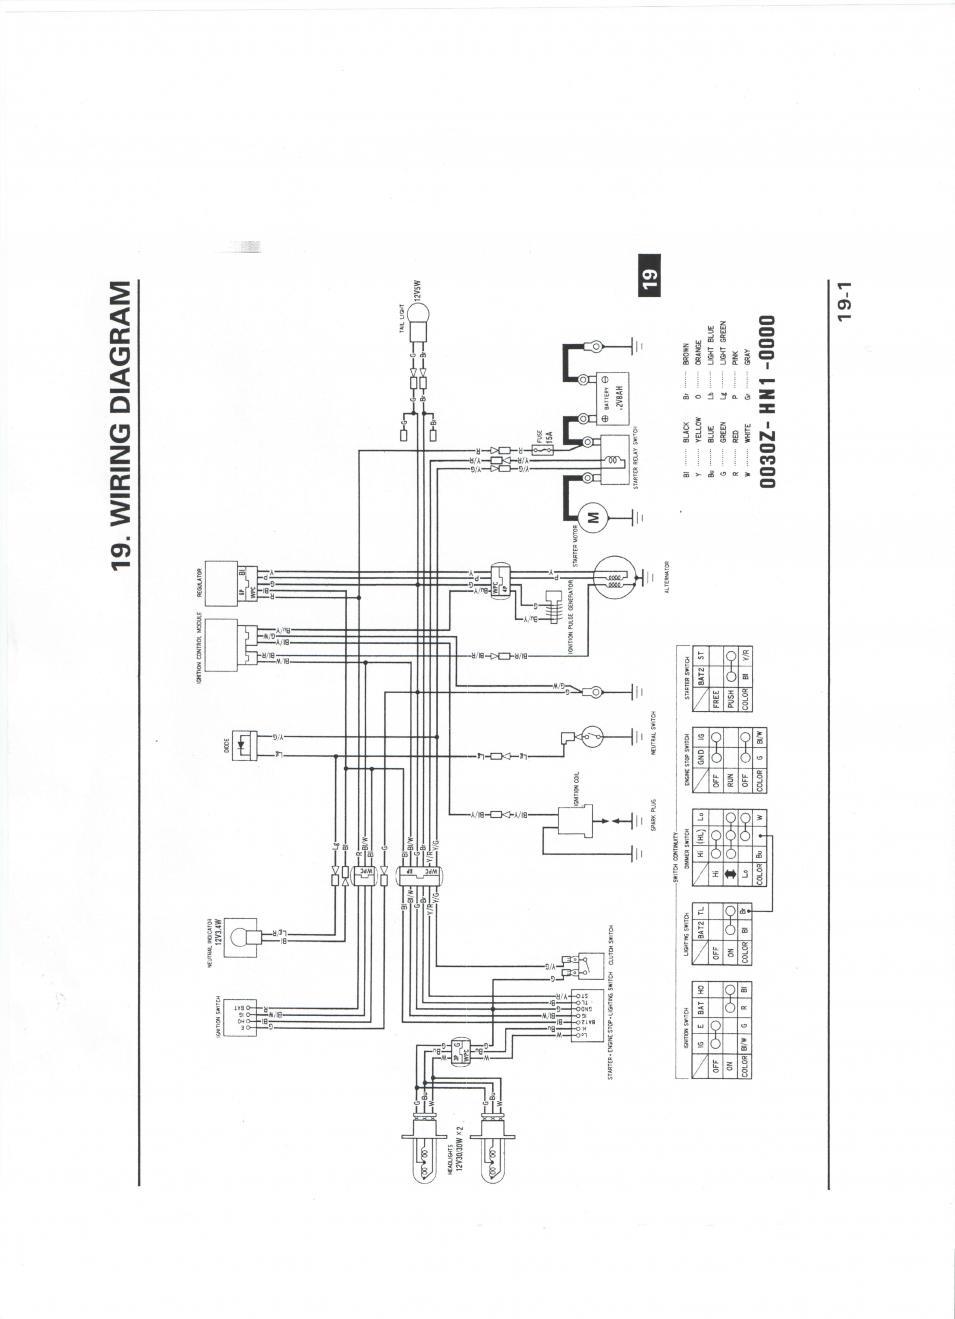 400ex headlight wiring diagram